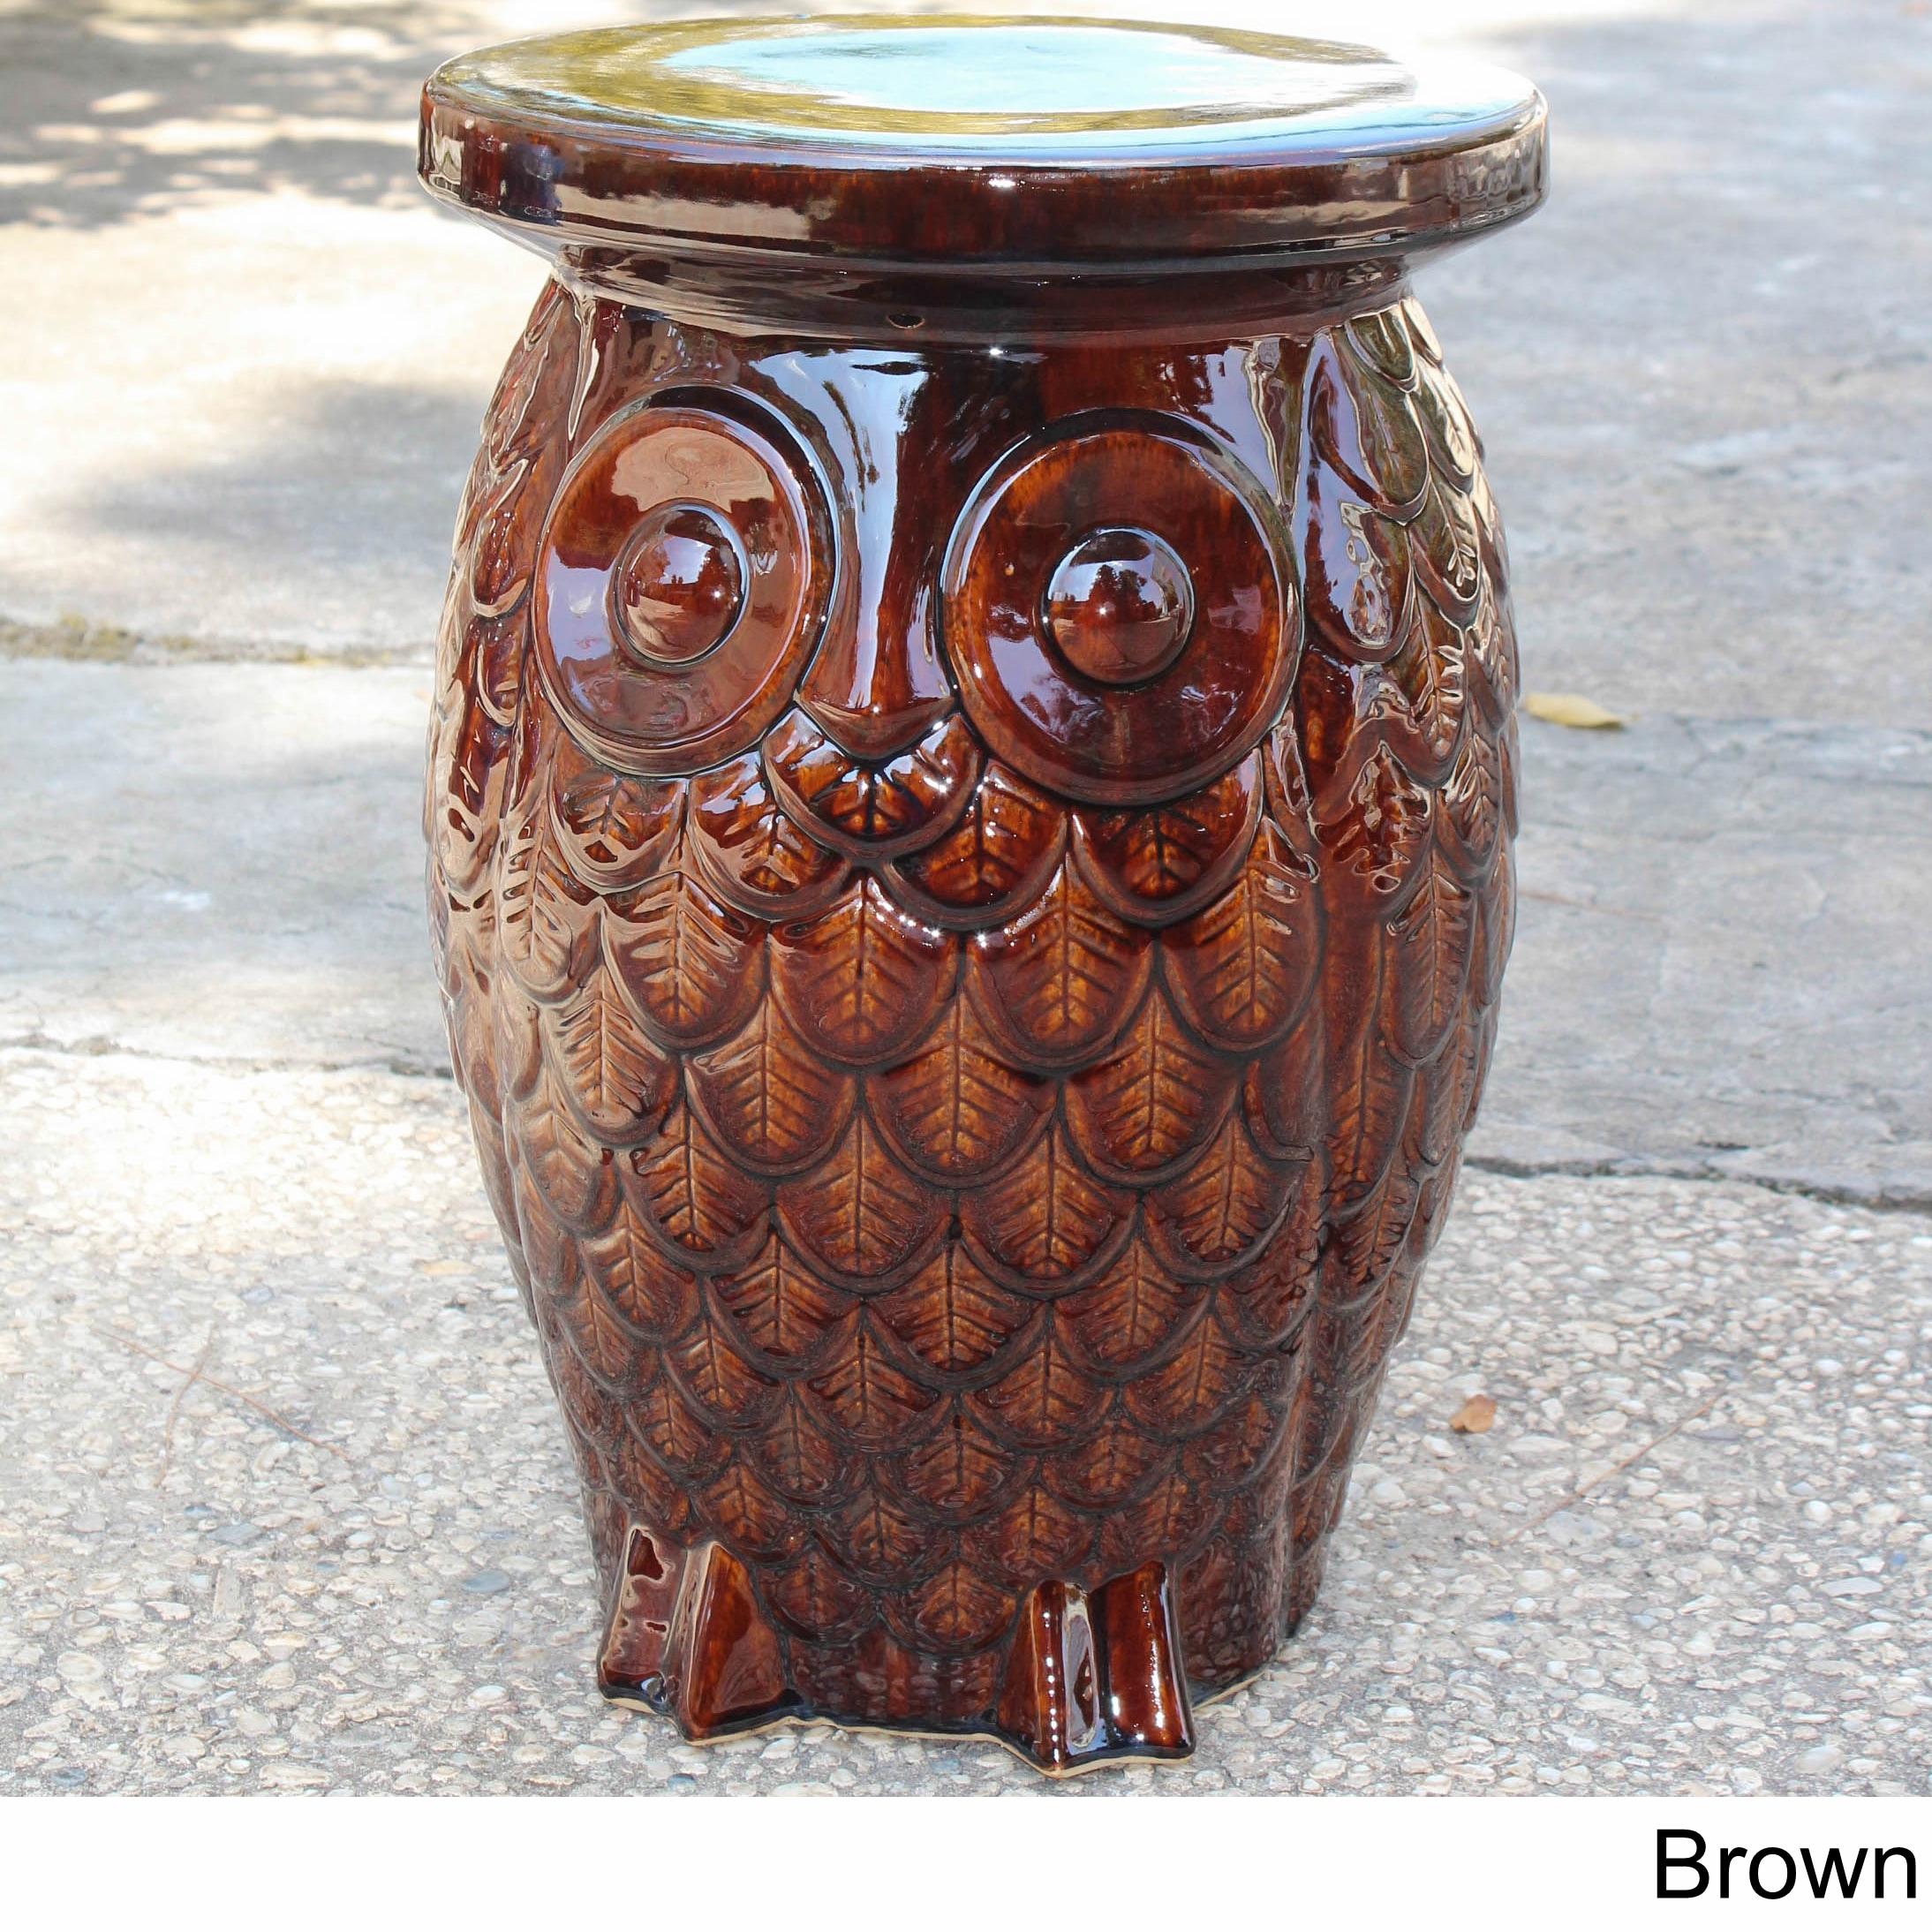 International Caravan Wise Old Owl Ceramic Garden Stool | eBay